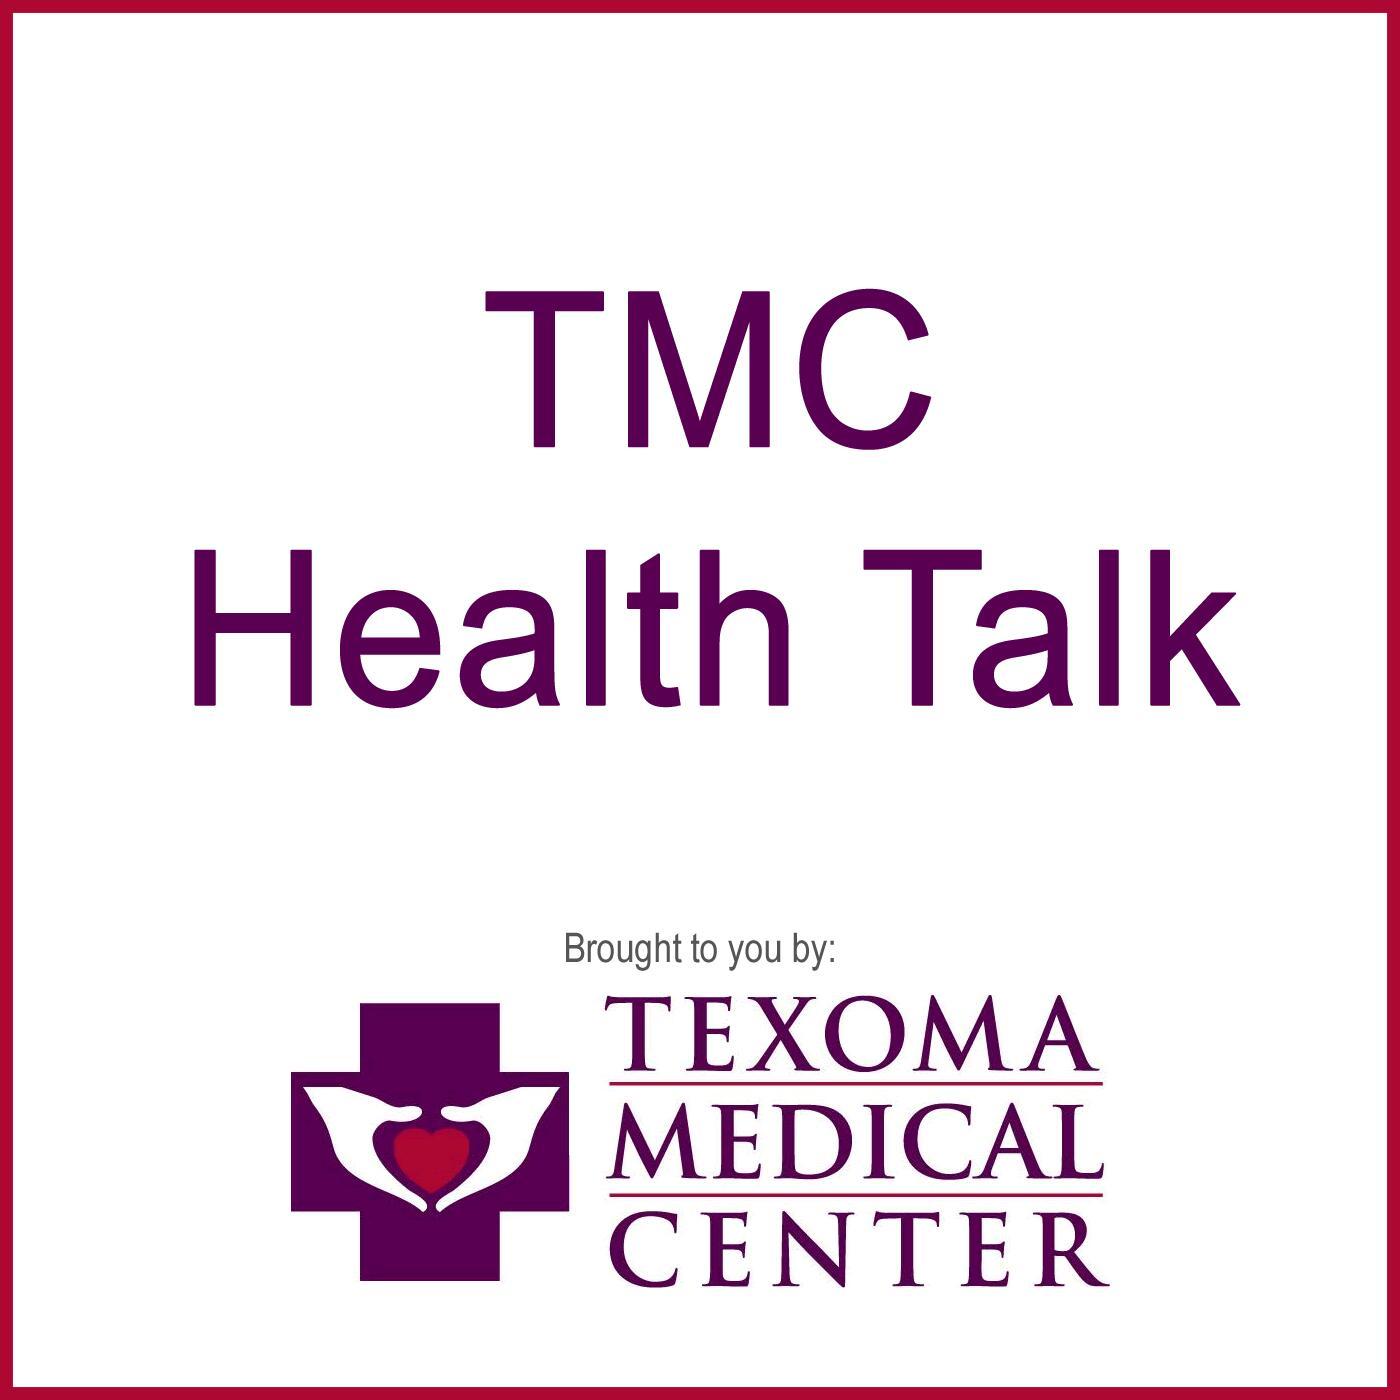 TMC Health Talk